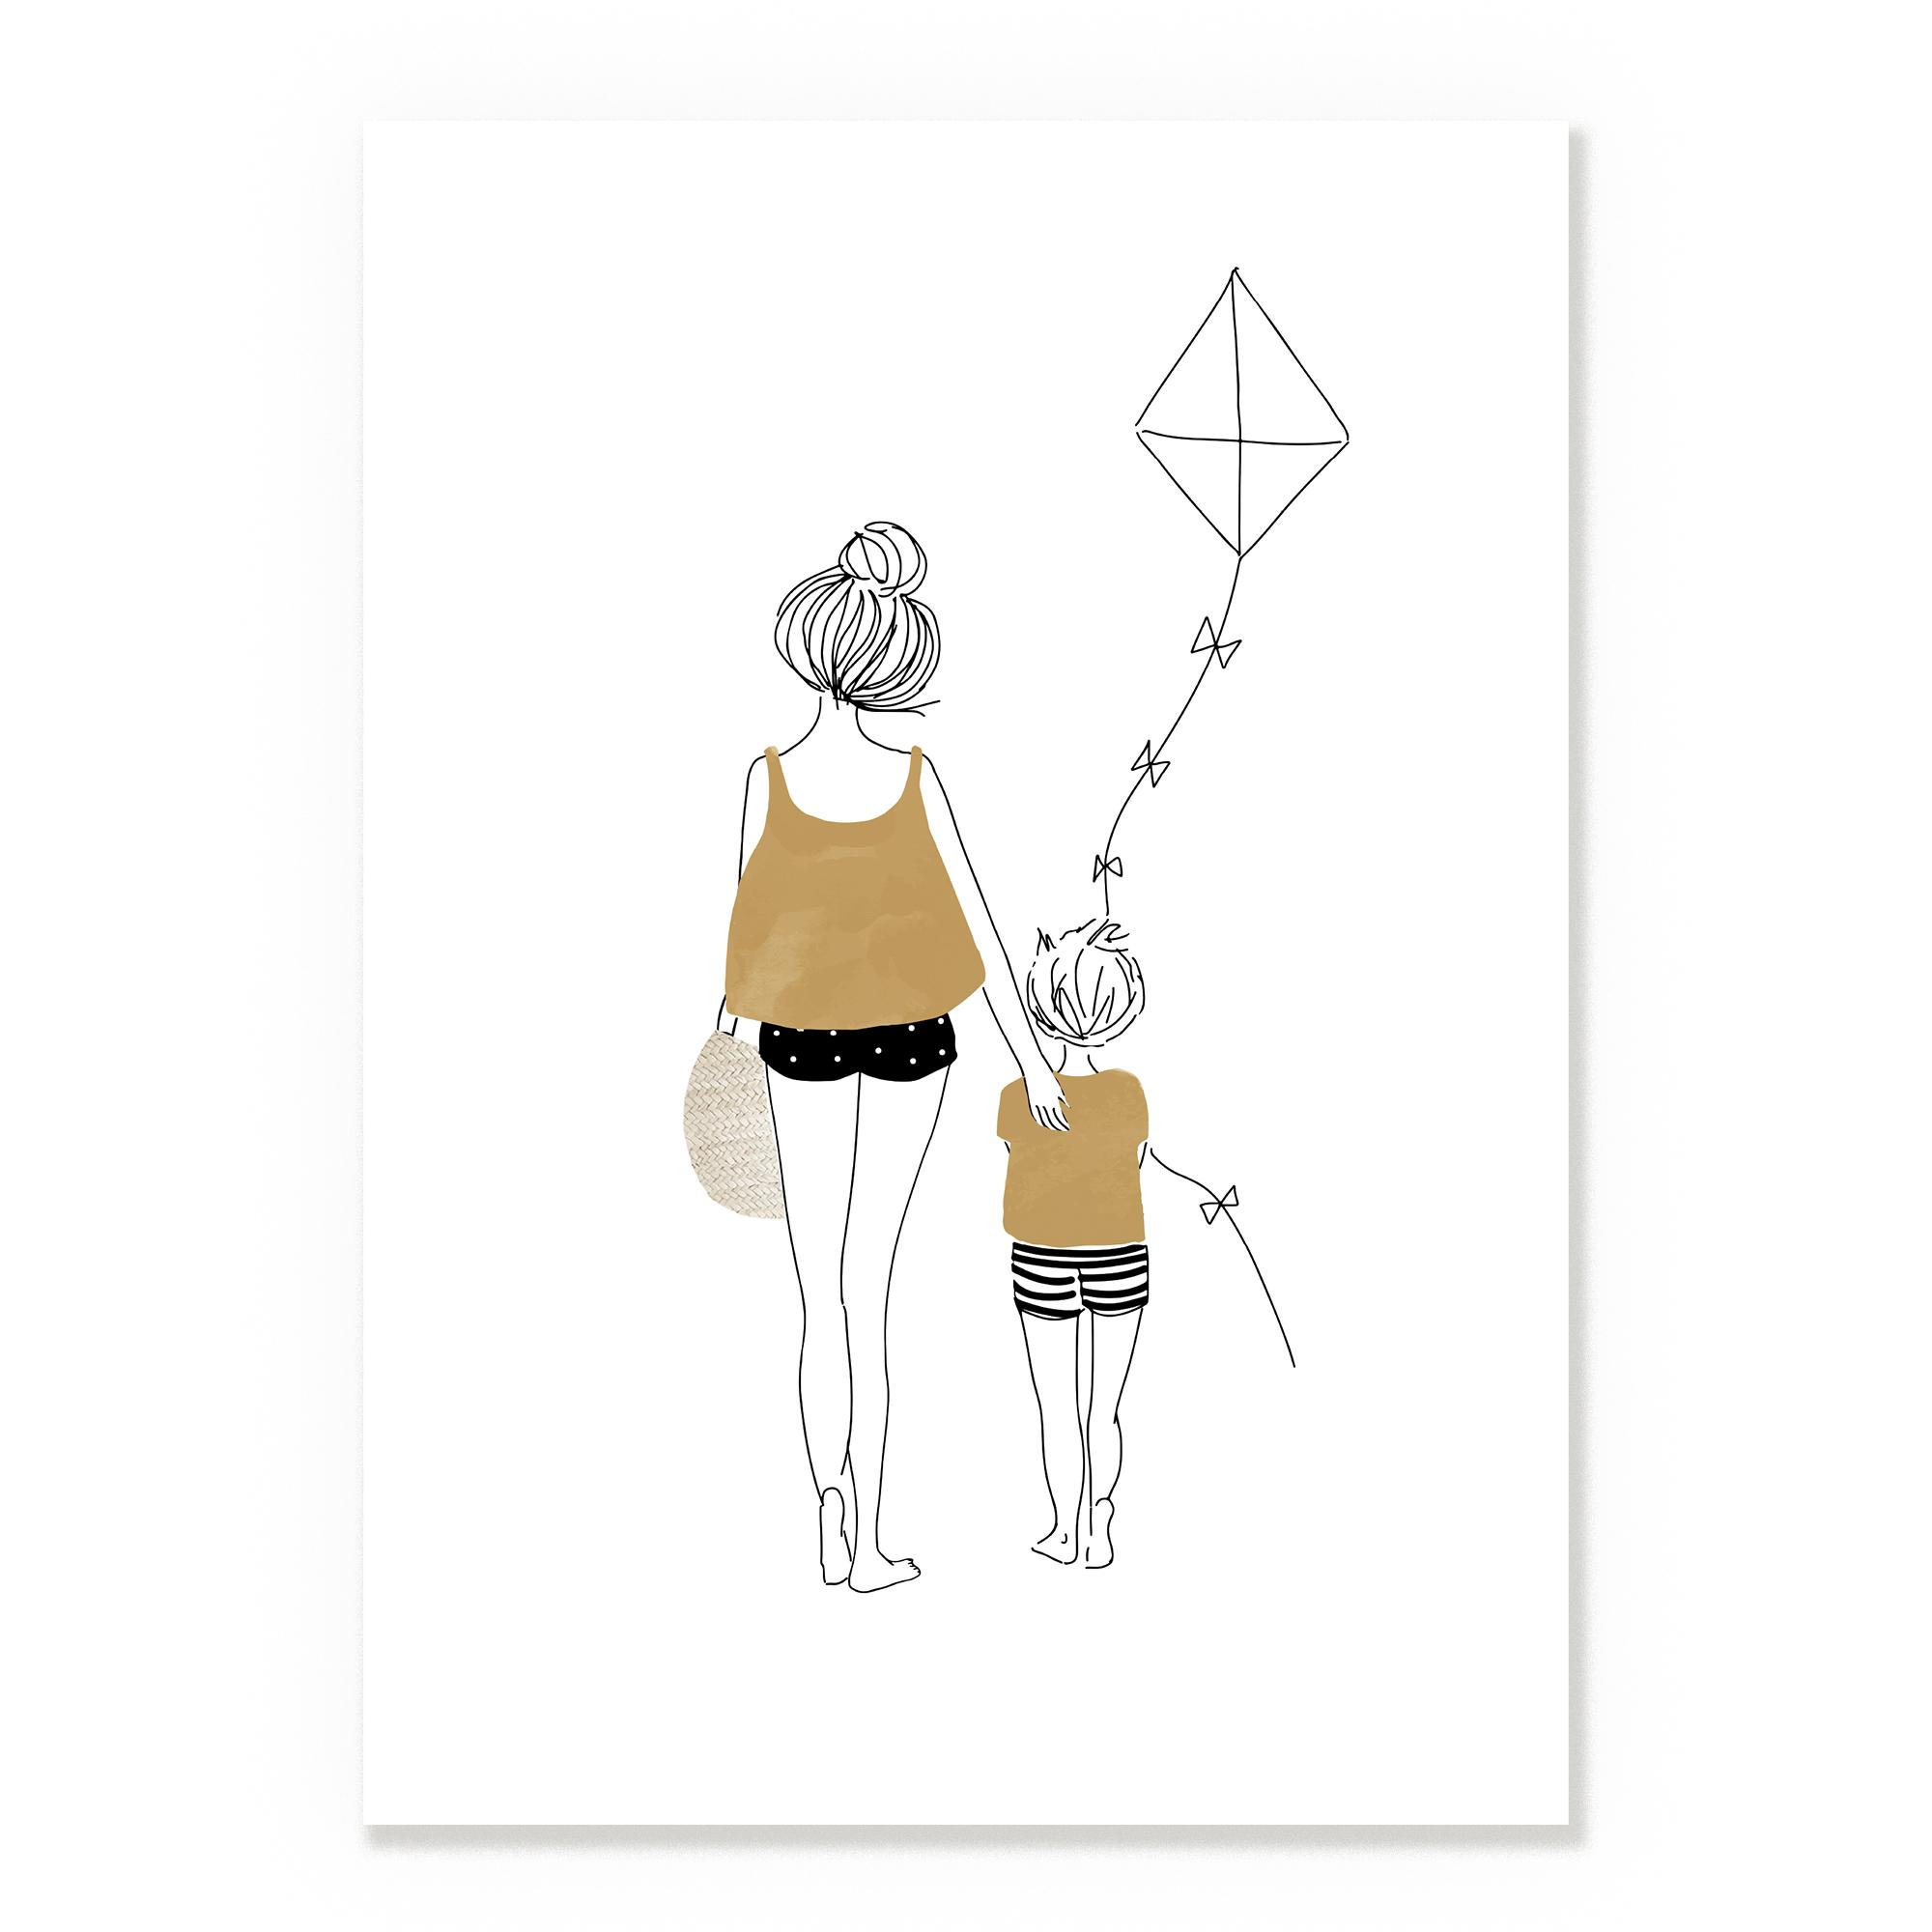 Kite A3 Print